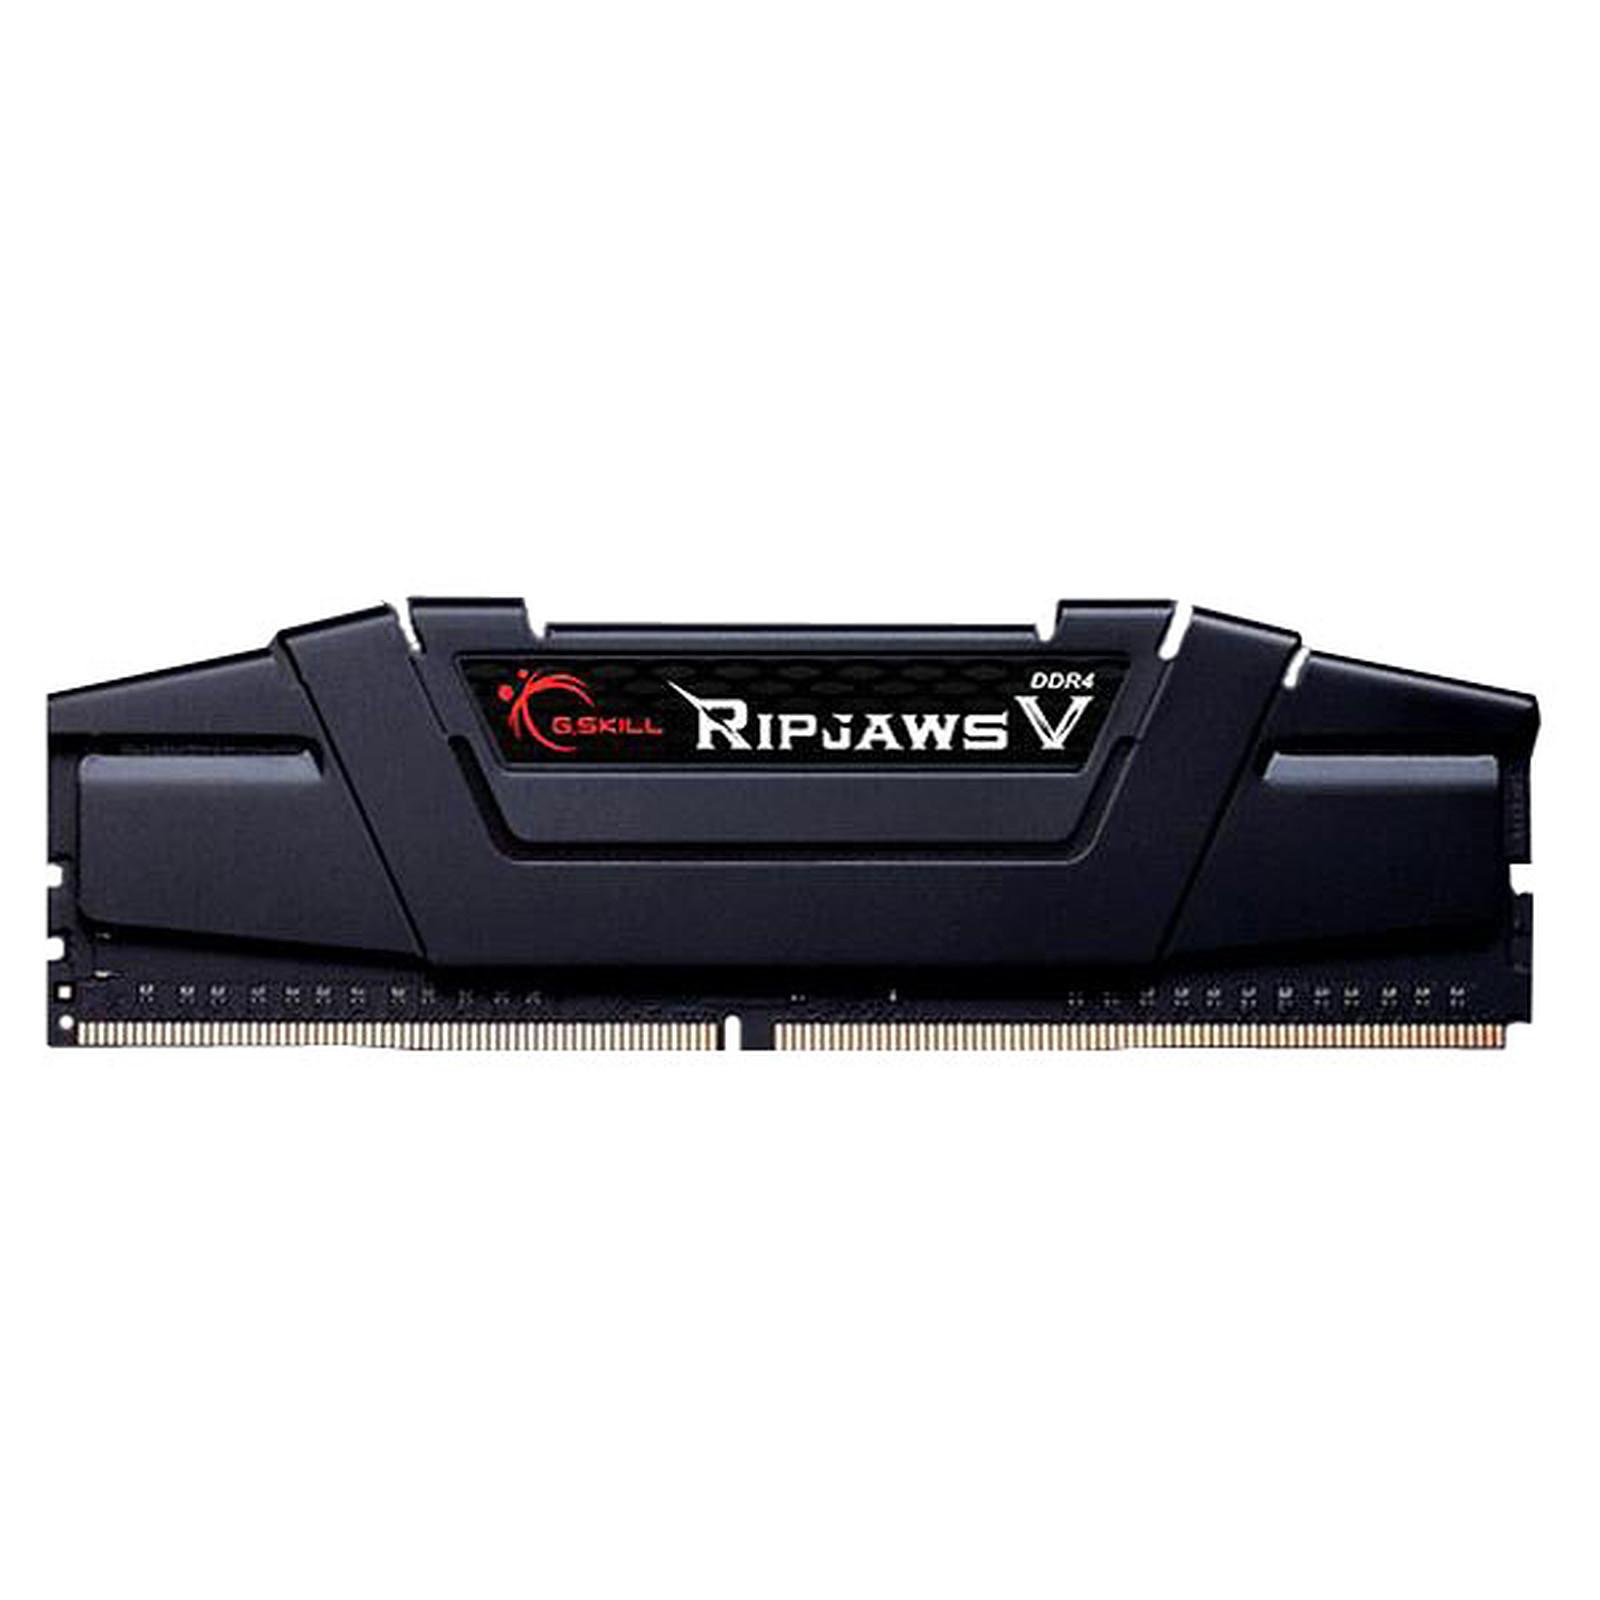 G.Skill RipJaws 5 Series Noir 16 Go (1 x 16 Go) DDR4 3200 MHz CL16